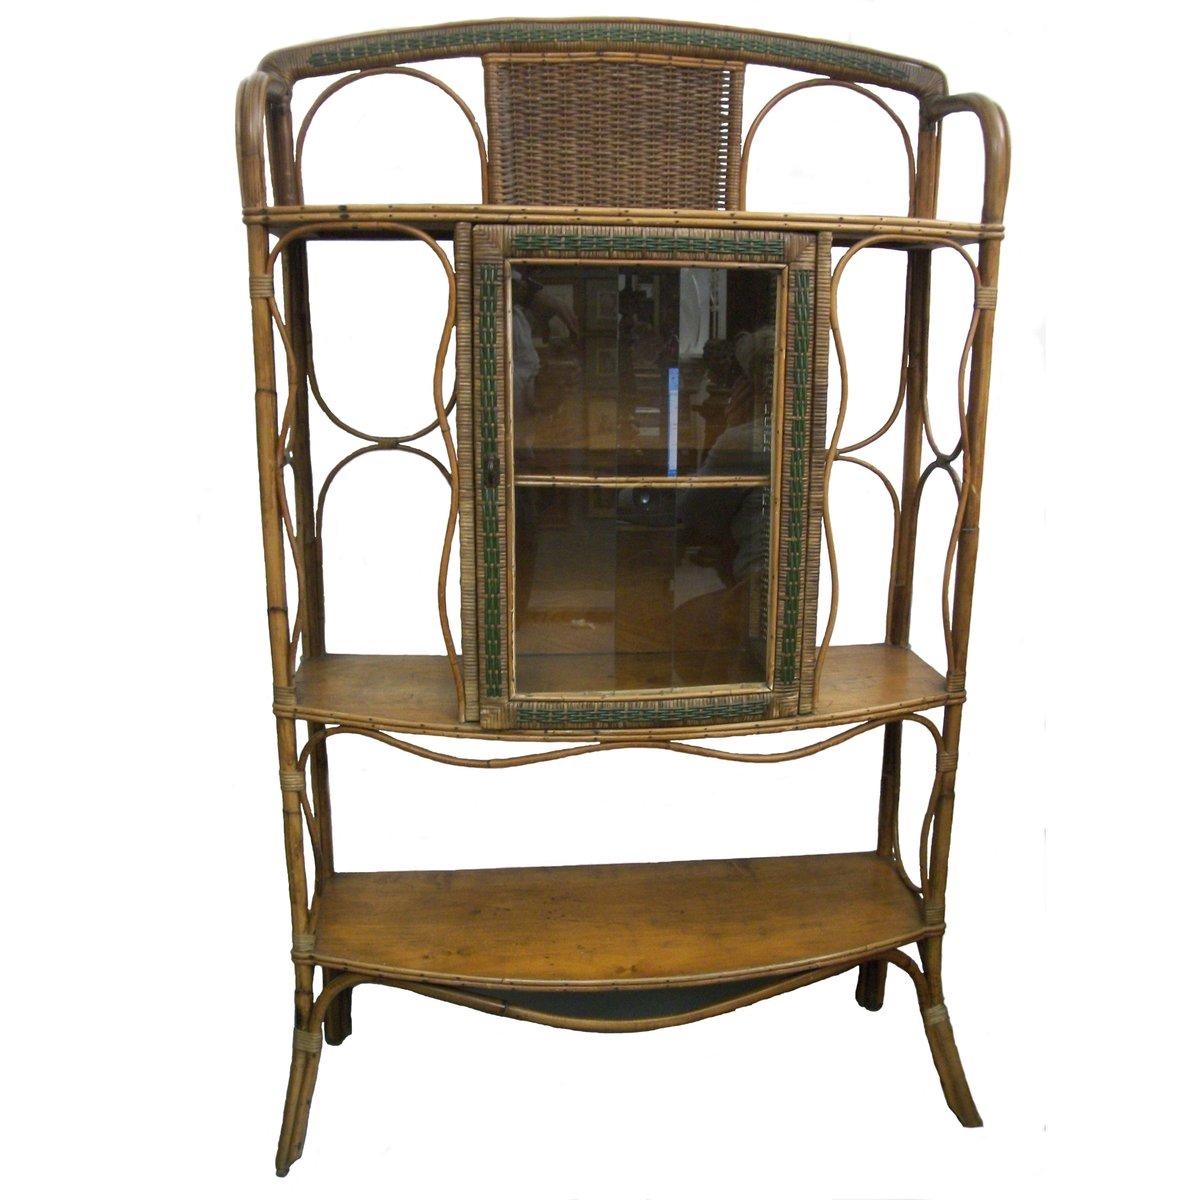 schrank aus korbgeflecht 1950er bei pamono kaufen. Black Bedroom Furniture Sets. Home Design Ideas